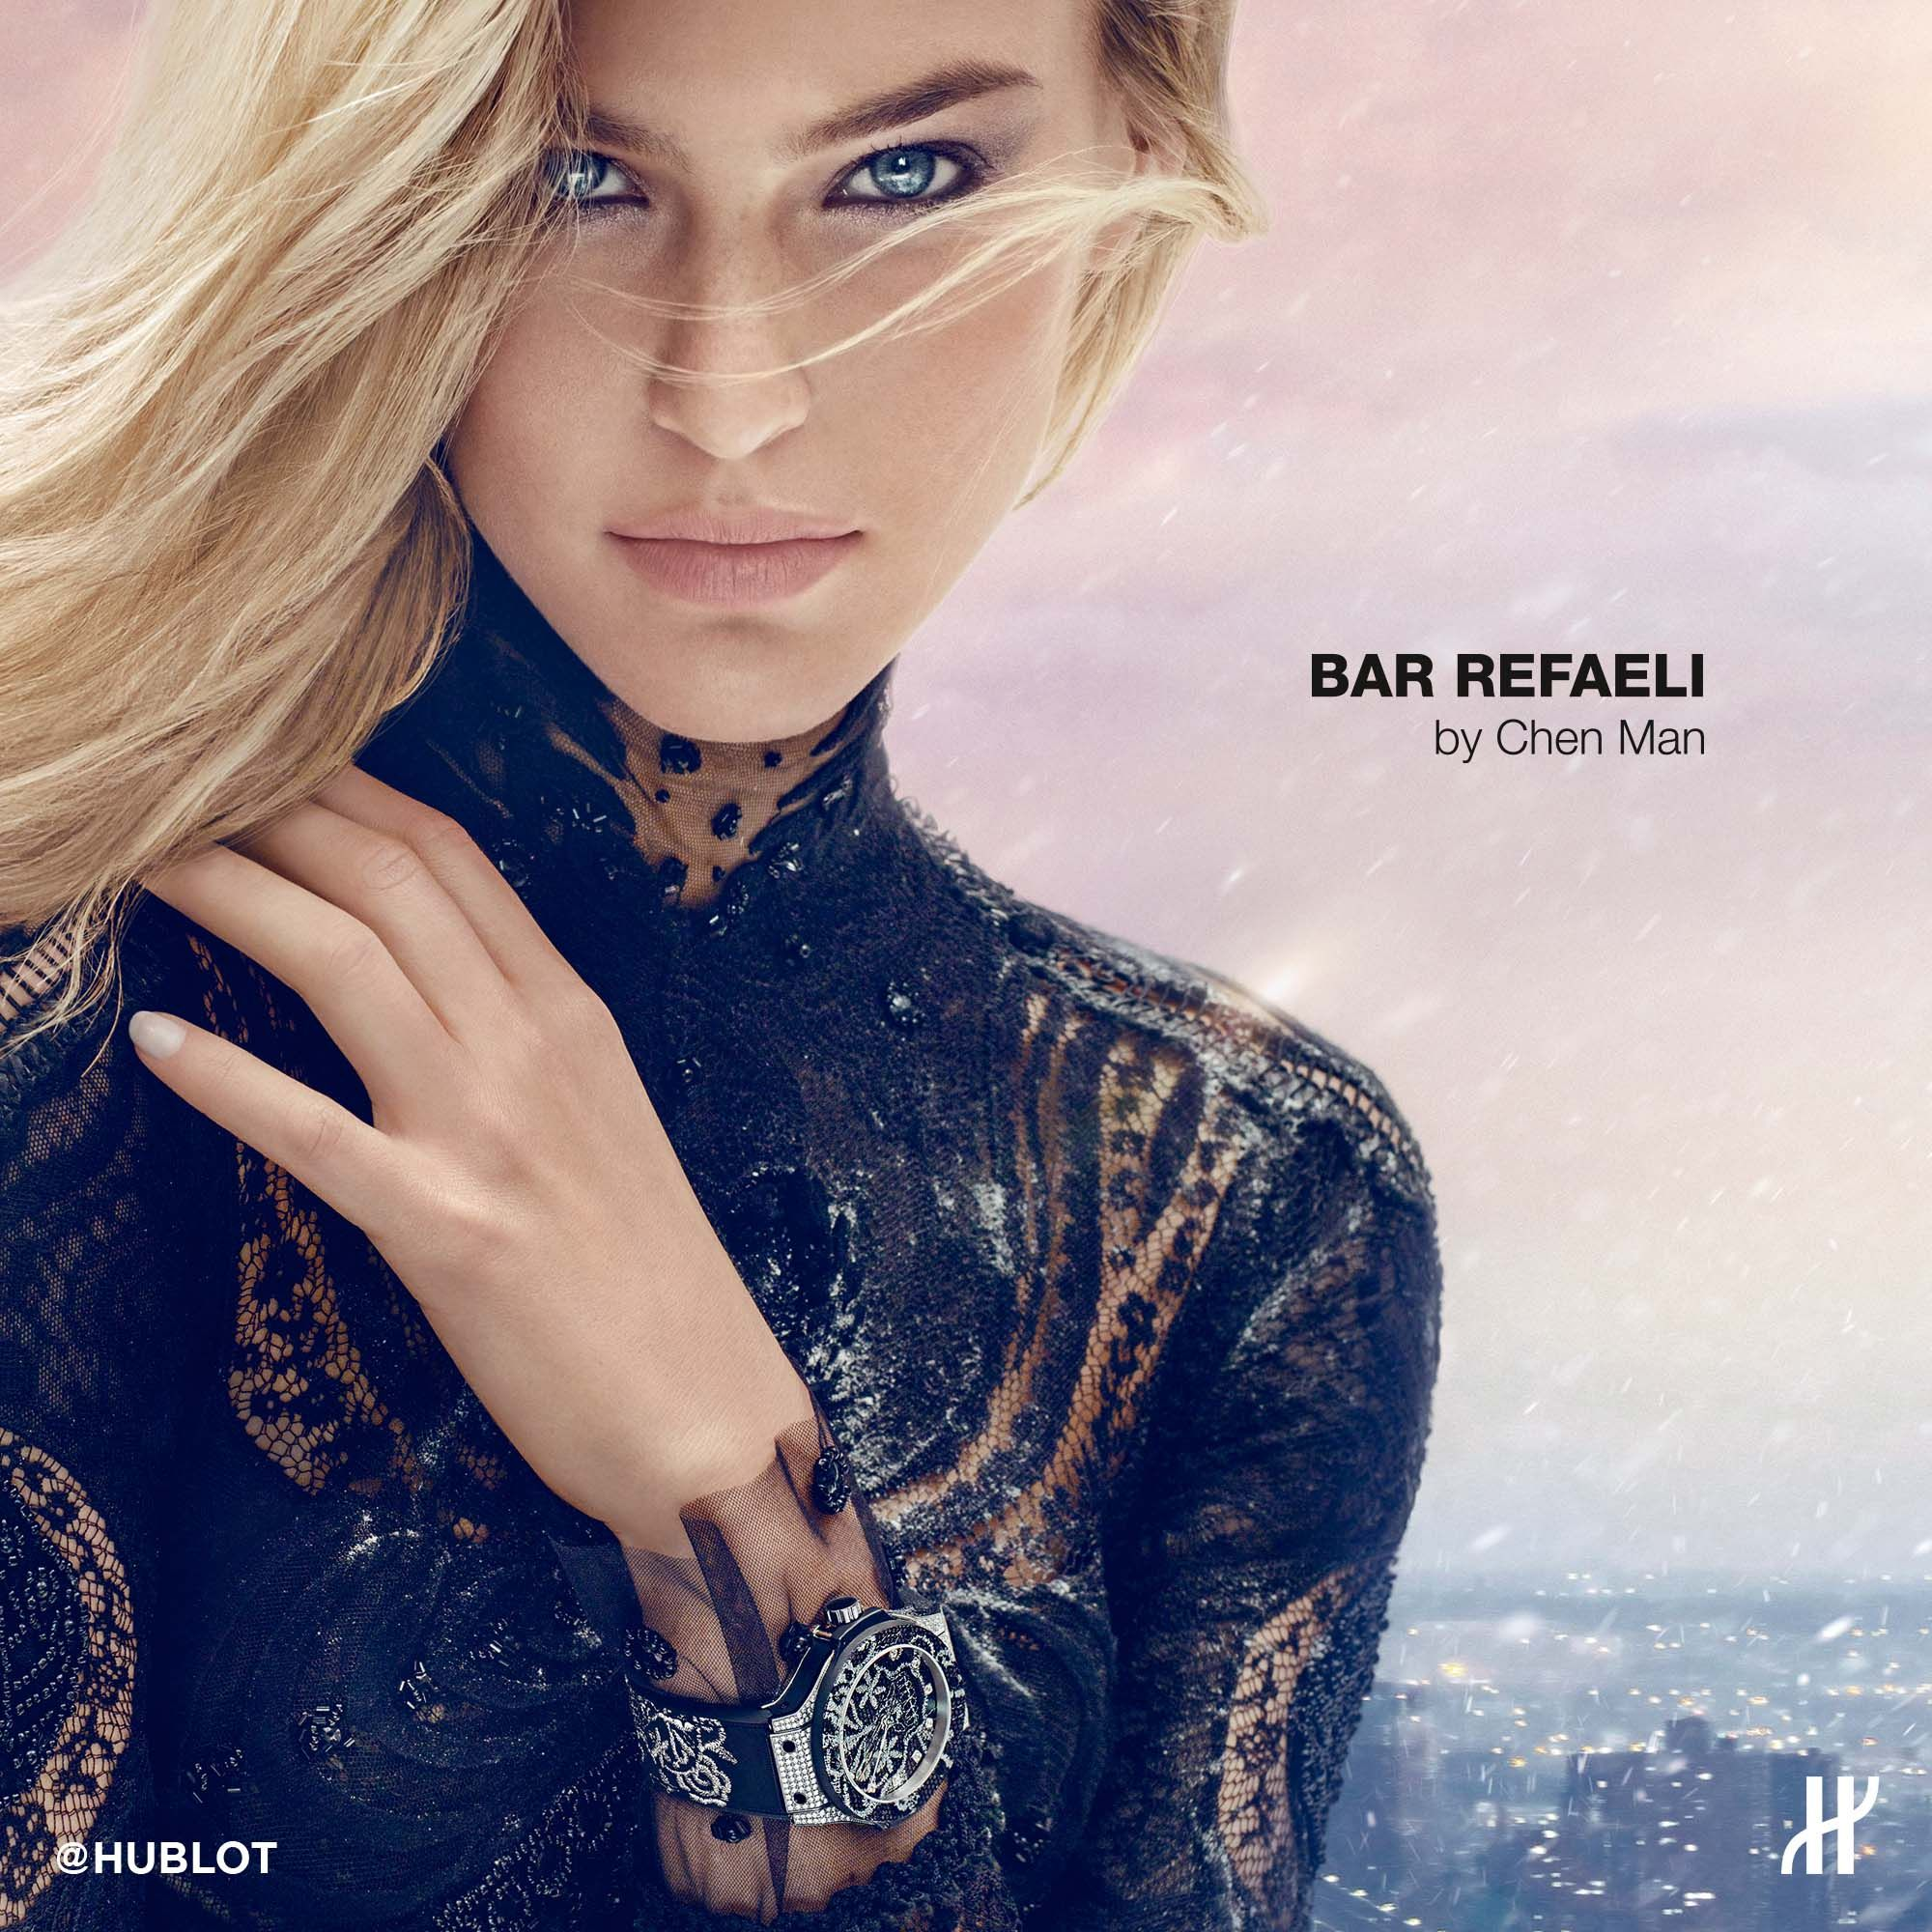 24dbf76d18 Bar Refaeli for HUBLOT # hublot # barrefaeli | Icons of ...